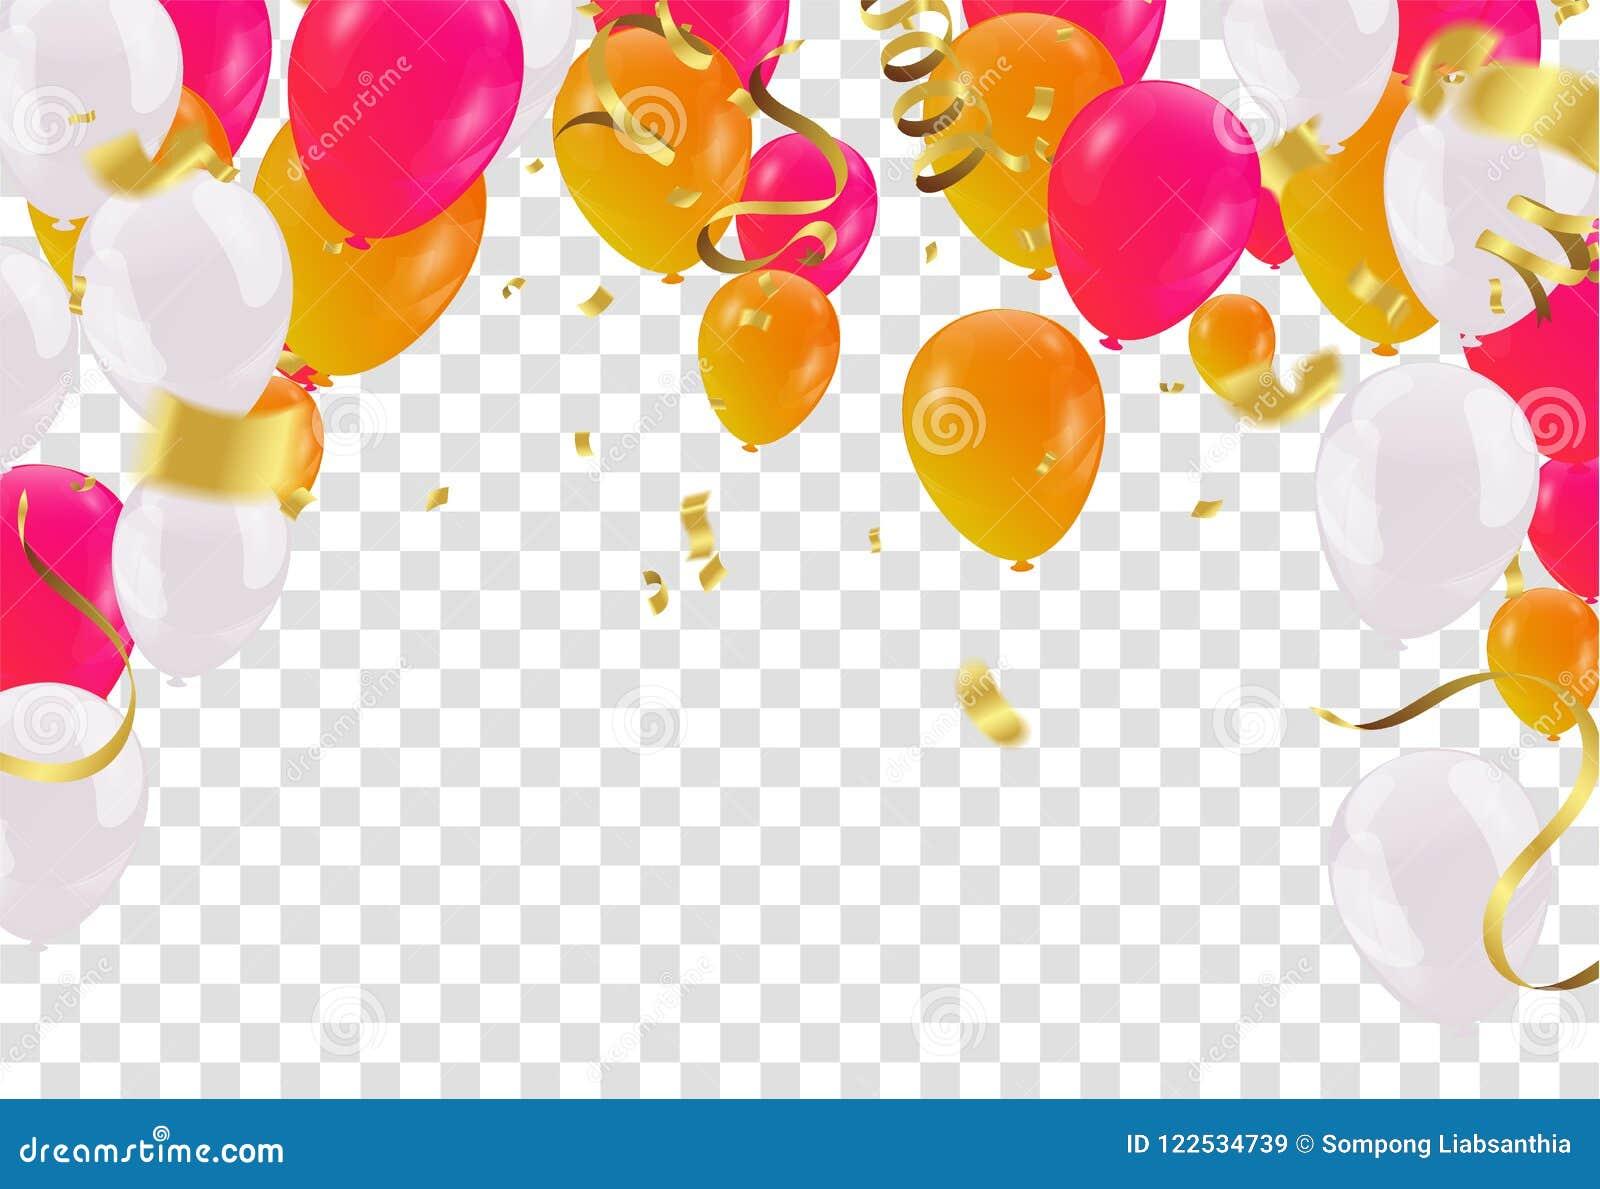 Balloons Header Background Design Element Of Birthday Or